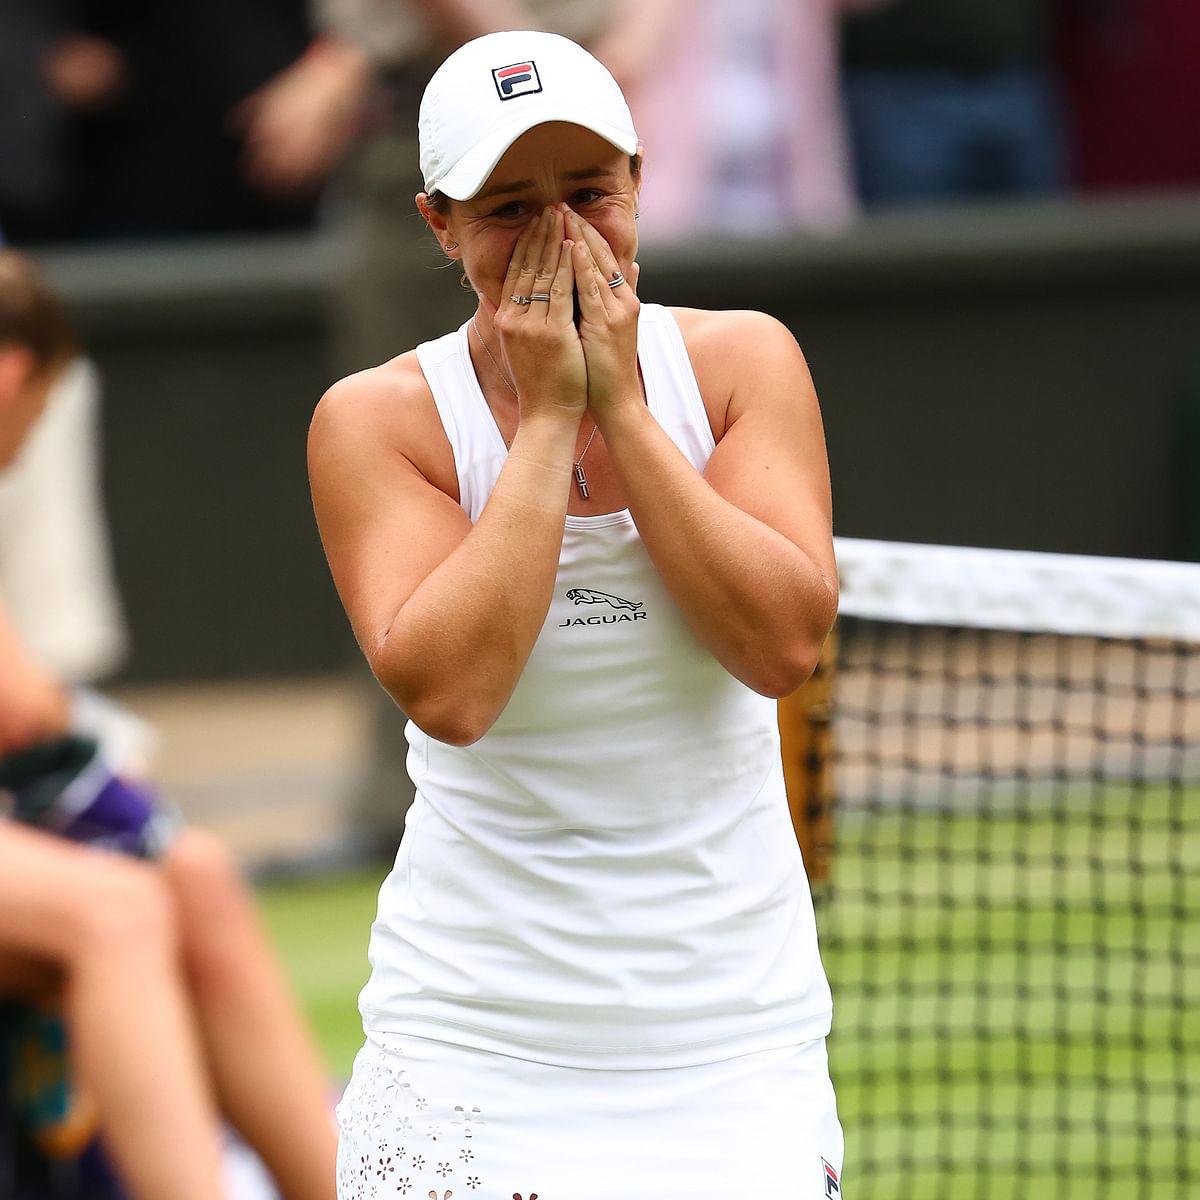 Wimbledon: Ashleigh Barty beats Karolina Pliskova to win maiden title [See Photos]